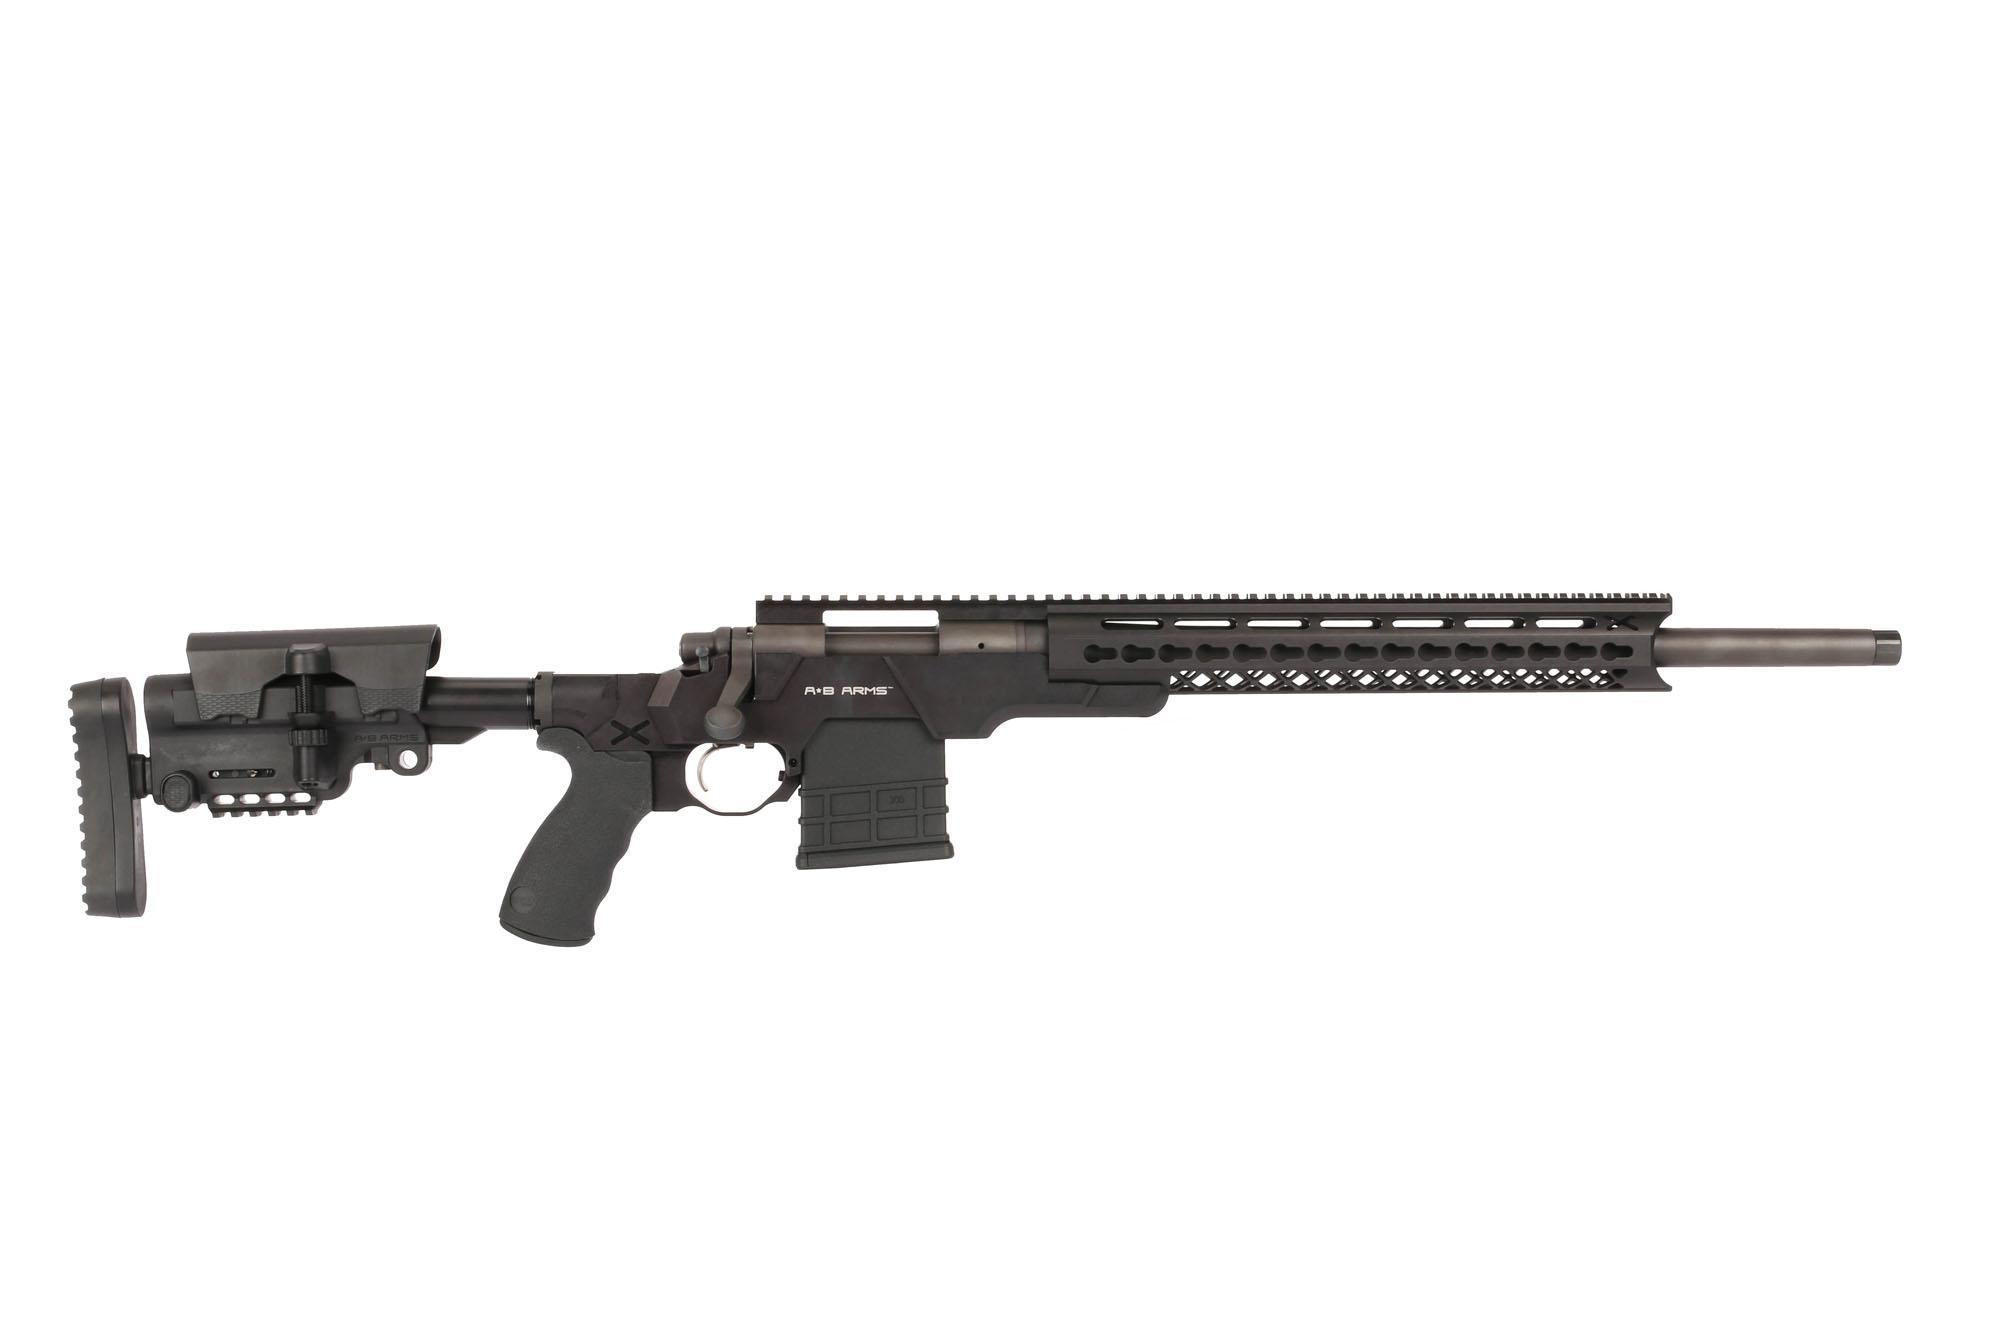 A*B Arms MOD*X Rifle -  308 Remington 700 SPS Tactical AAC-SD